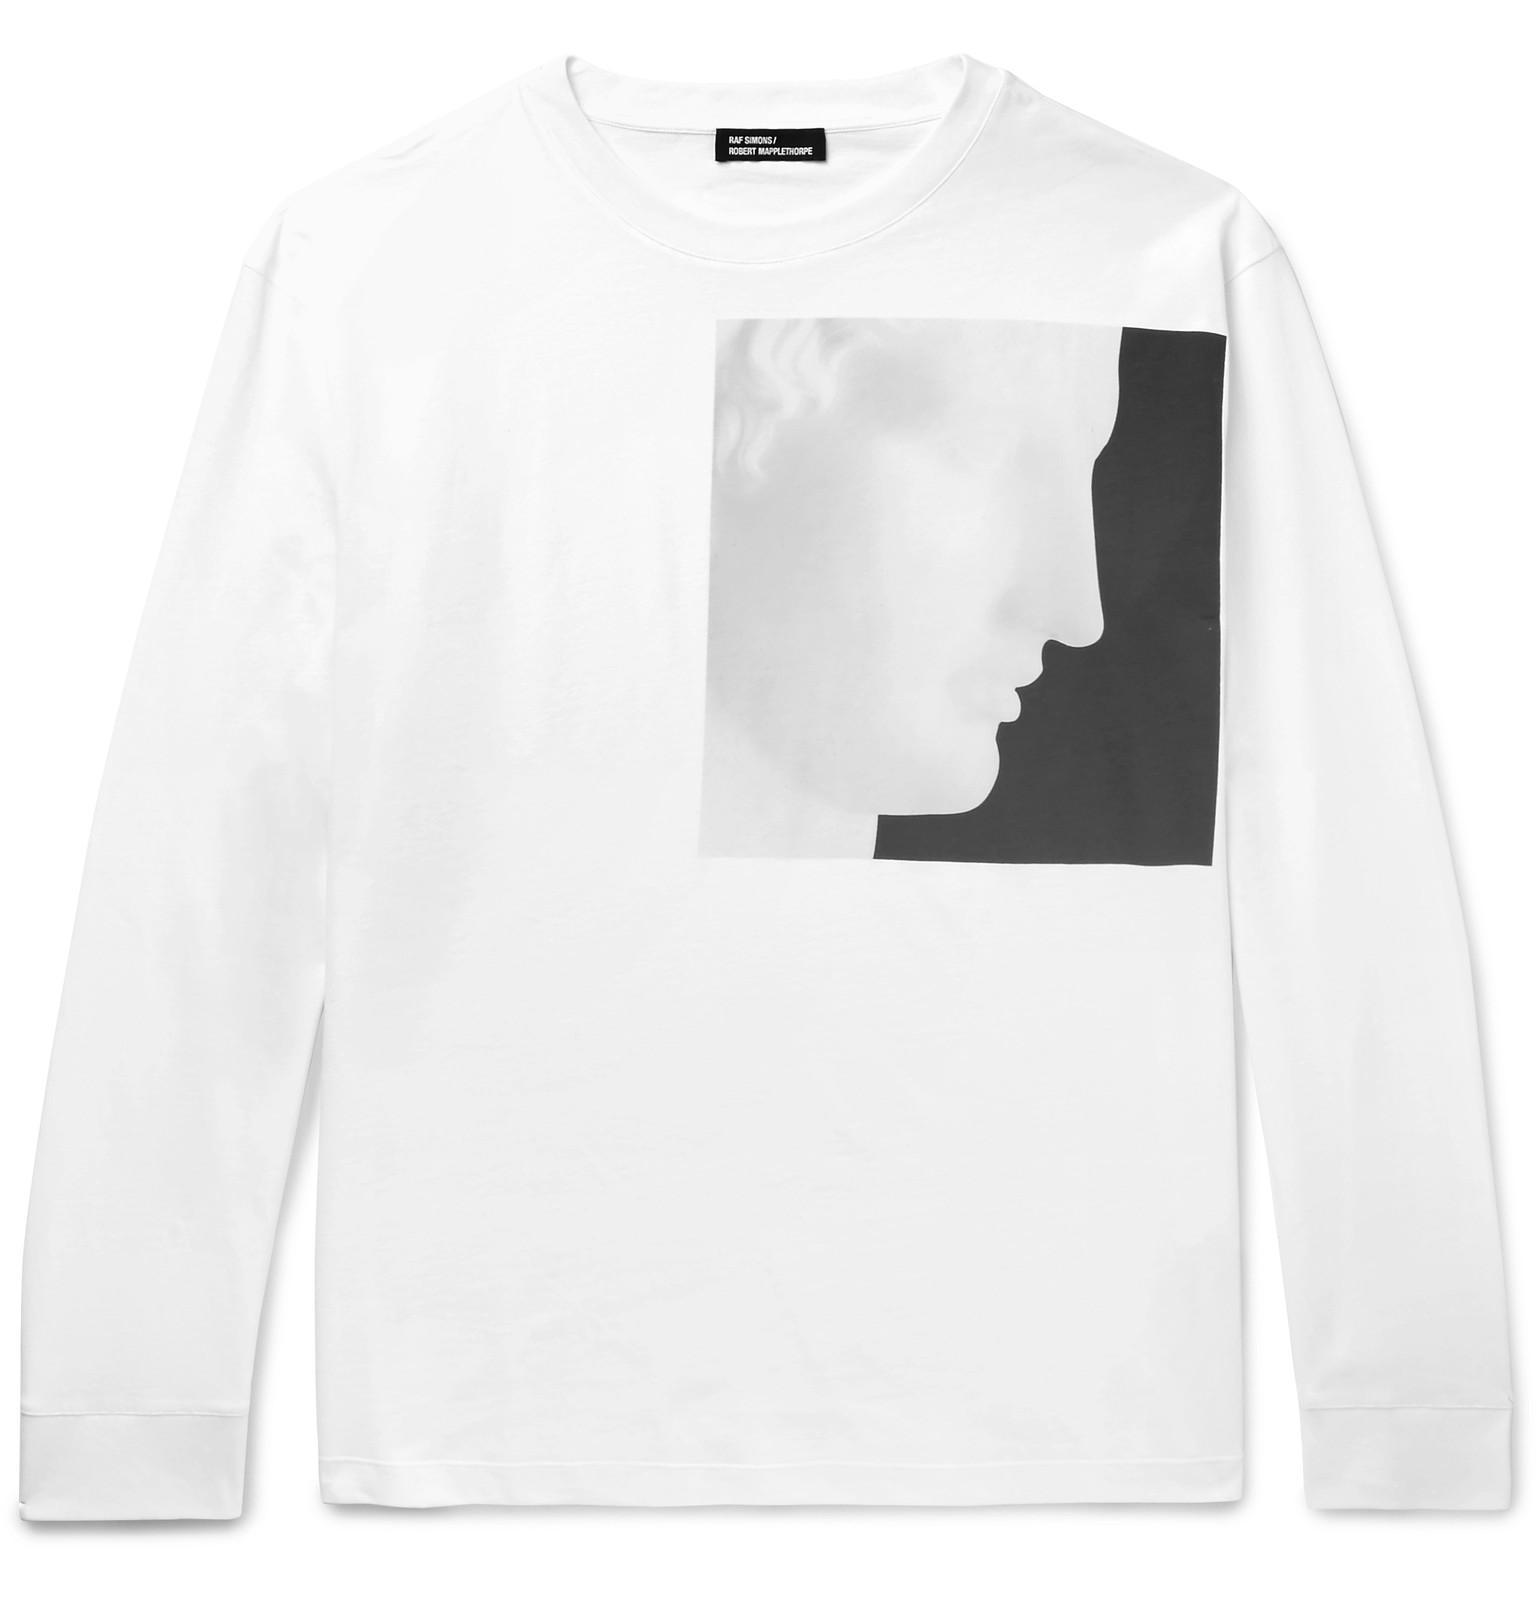 Raf simons robert mapplethorpe foundation printed for Raf simons robert mapplethorpe shirt